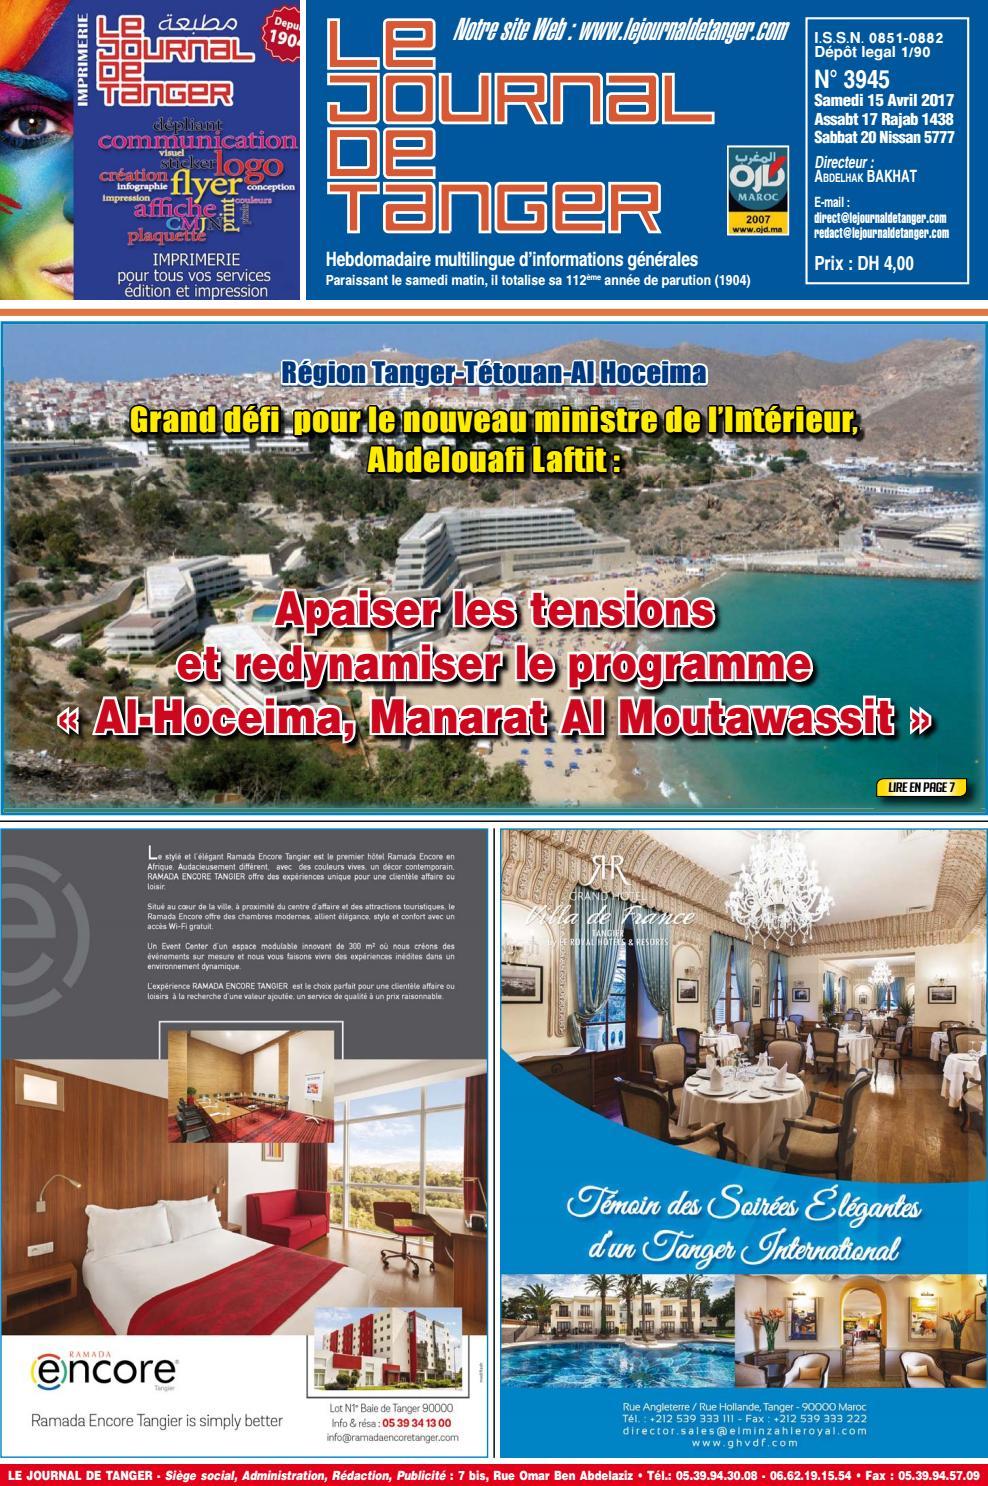 Le Journal De Tanger 15 Avril 2017 By Le Journal De Tanger